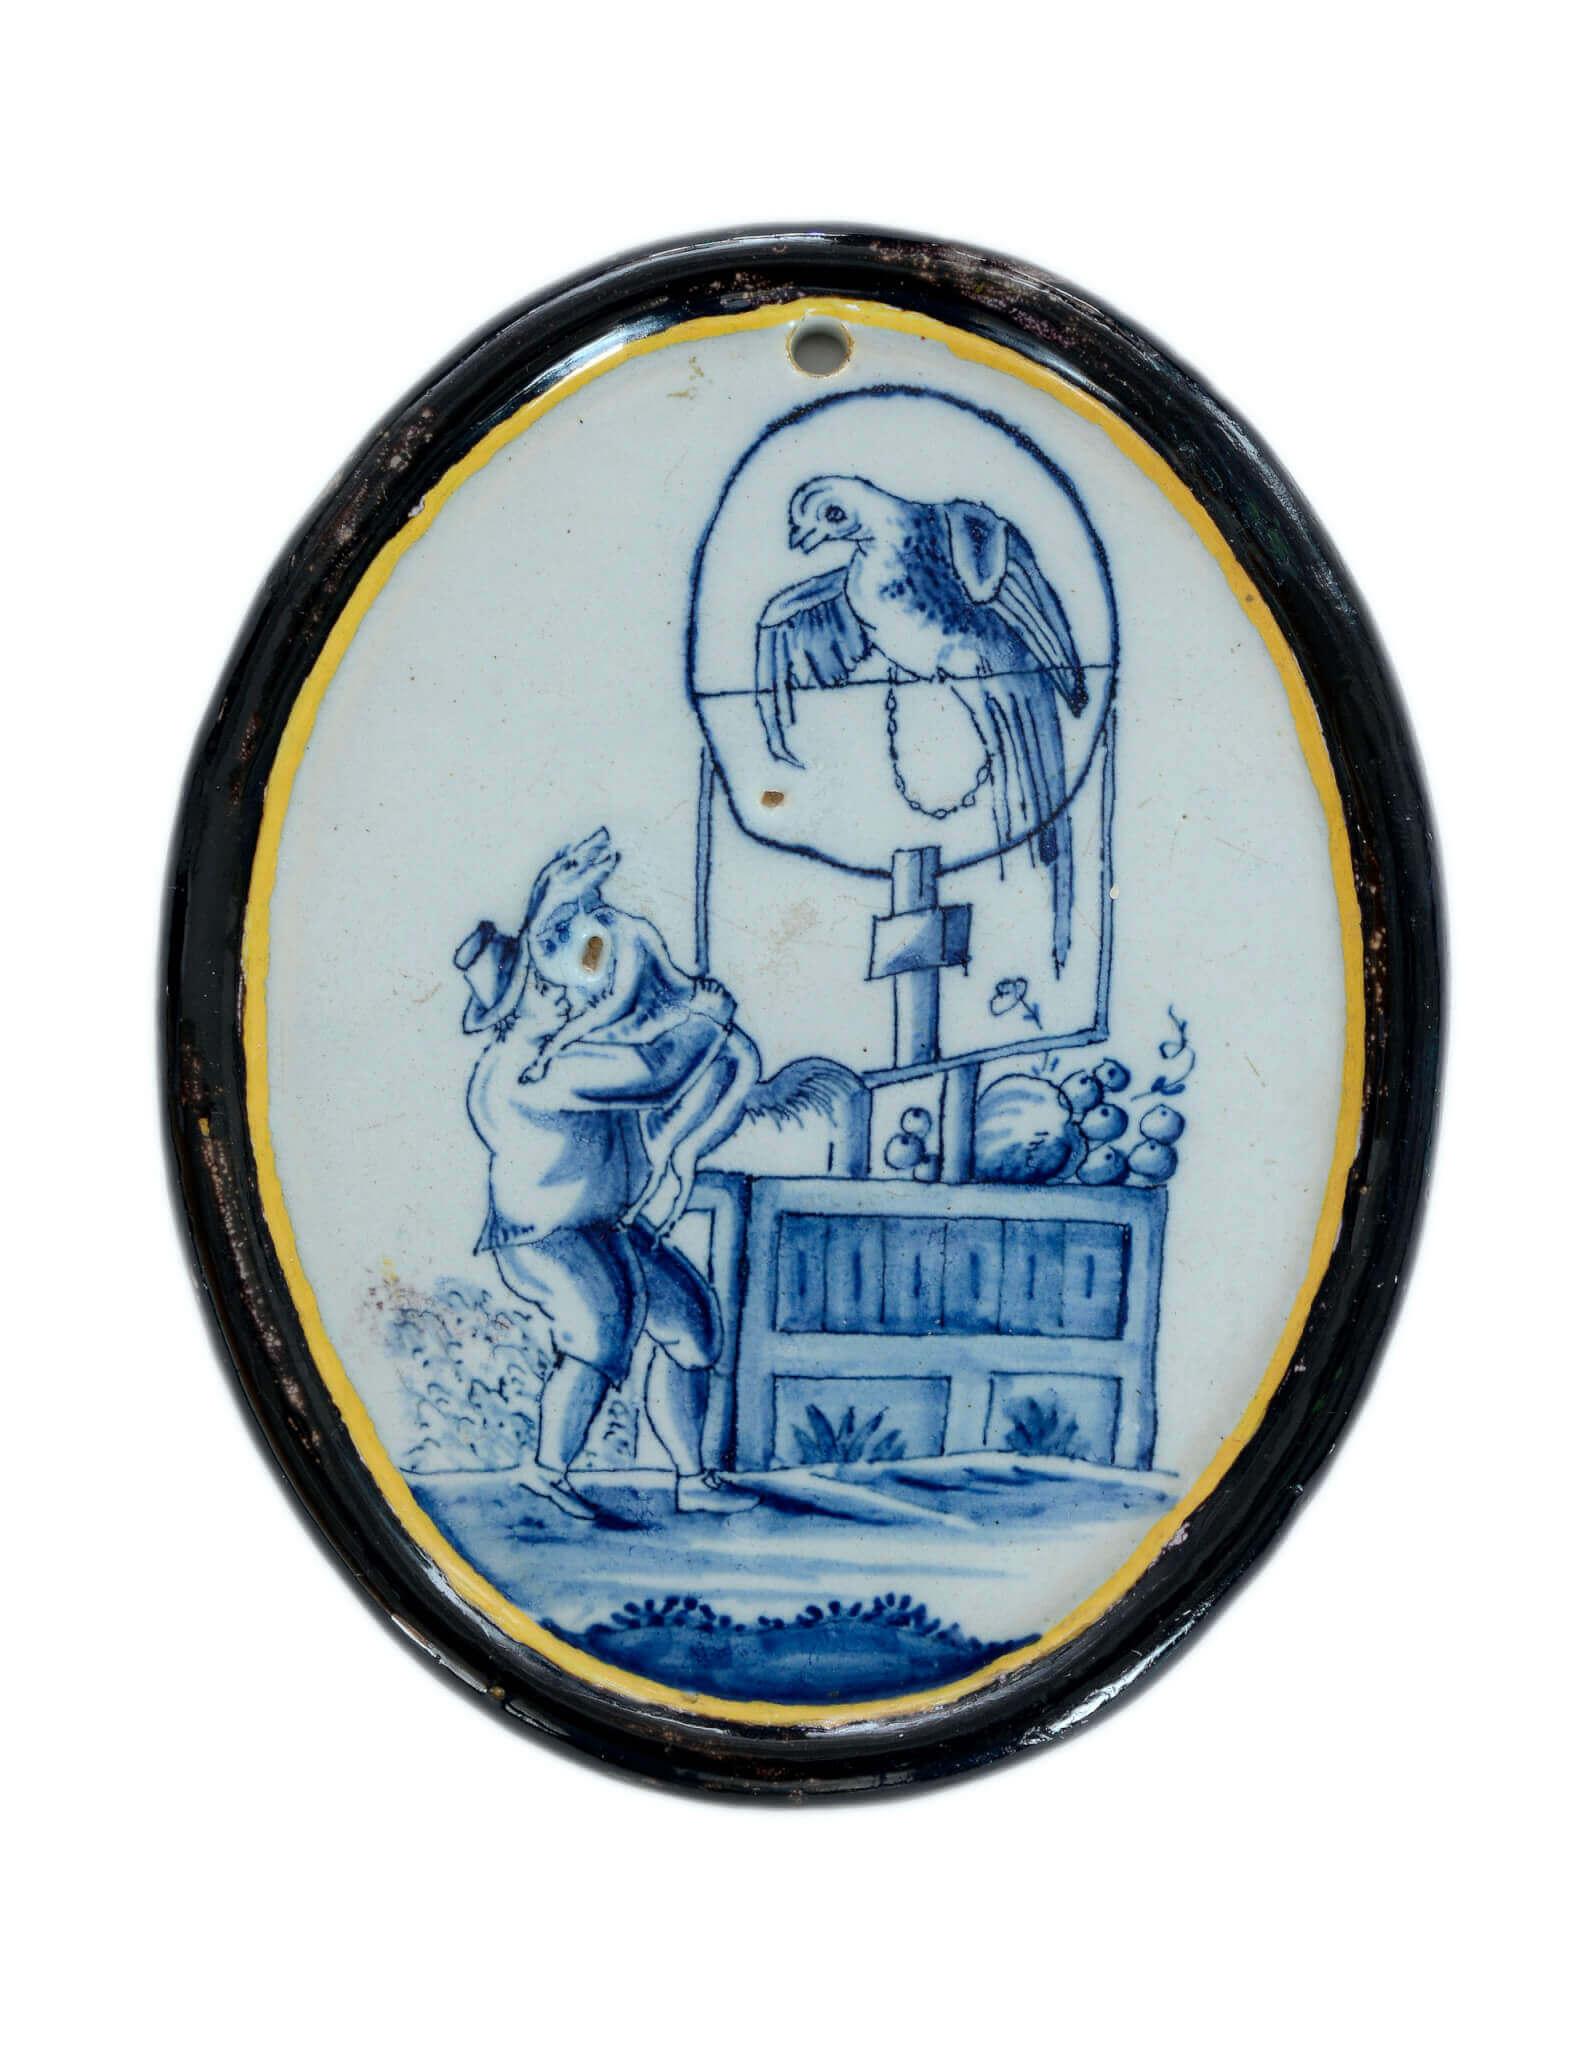 Delftware plaque with bird